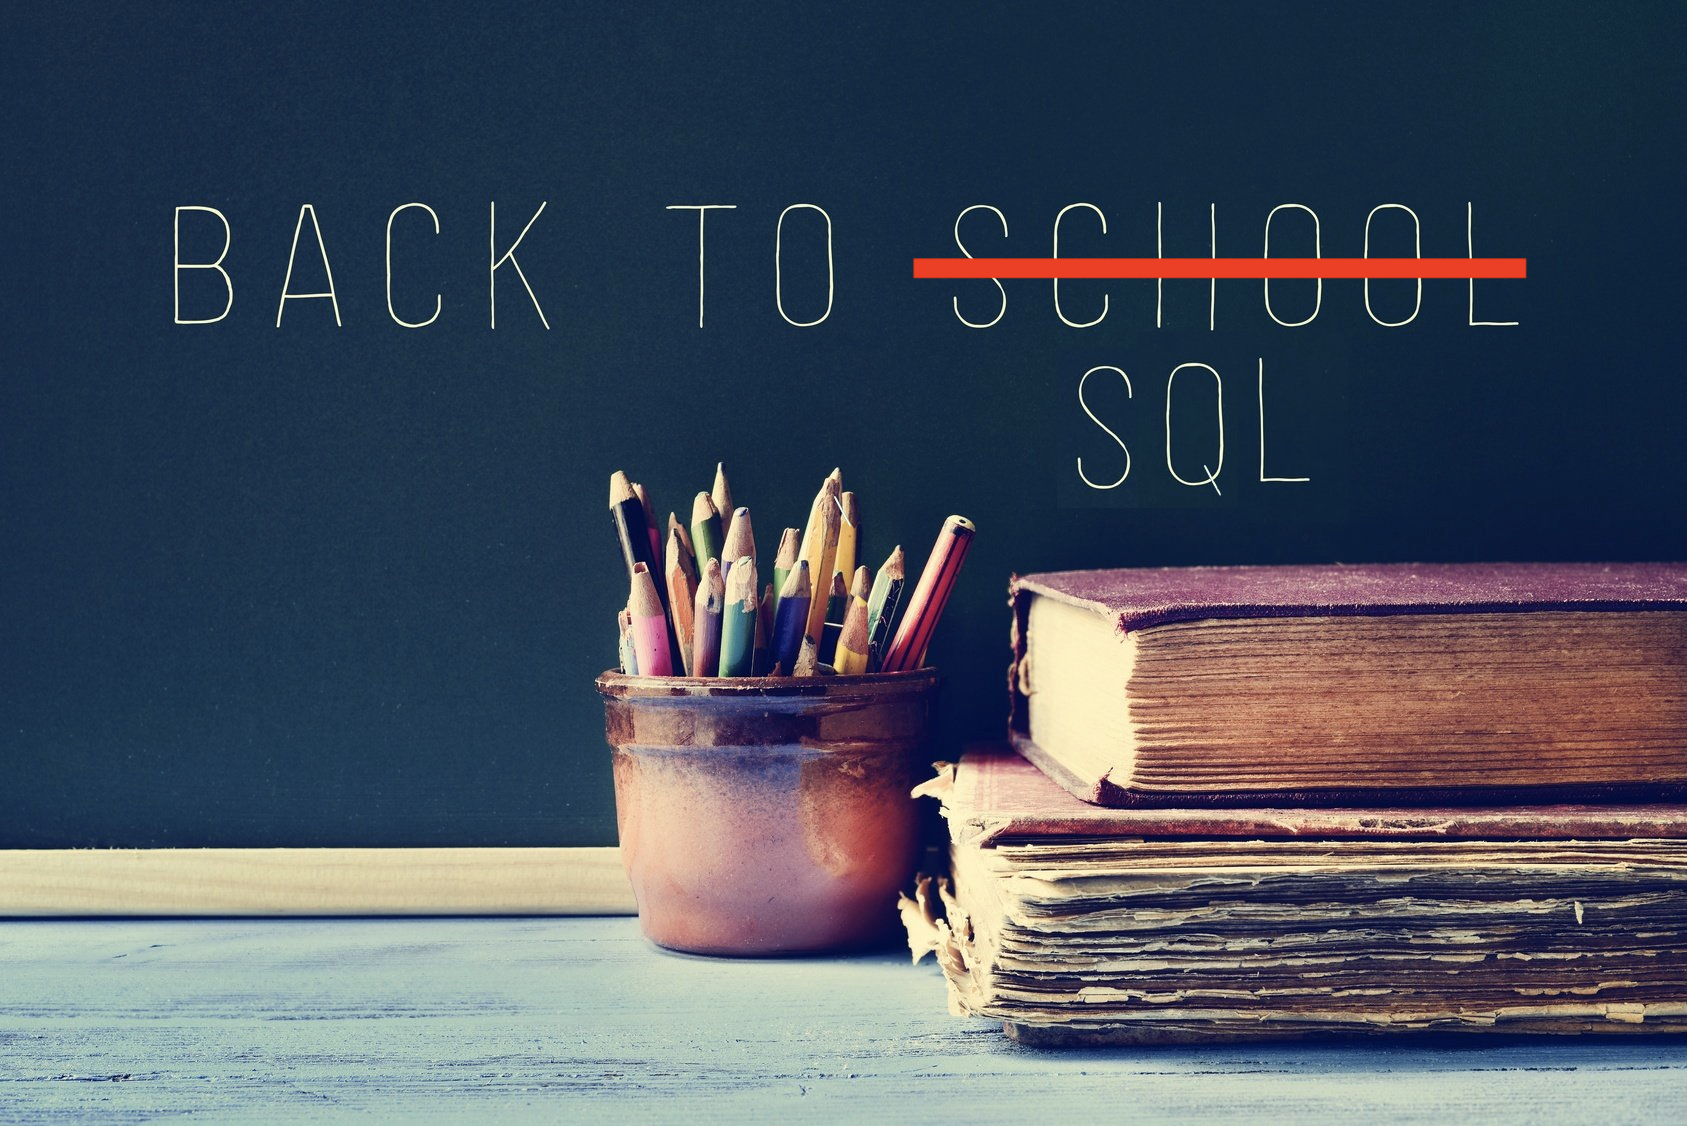 Back to School... no, SQL.